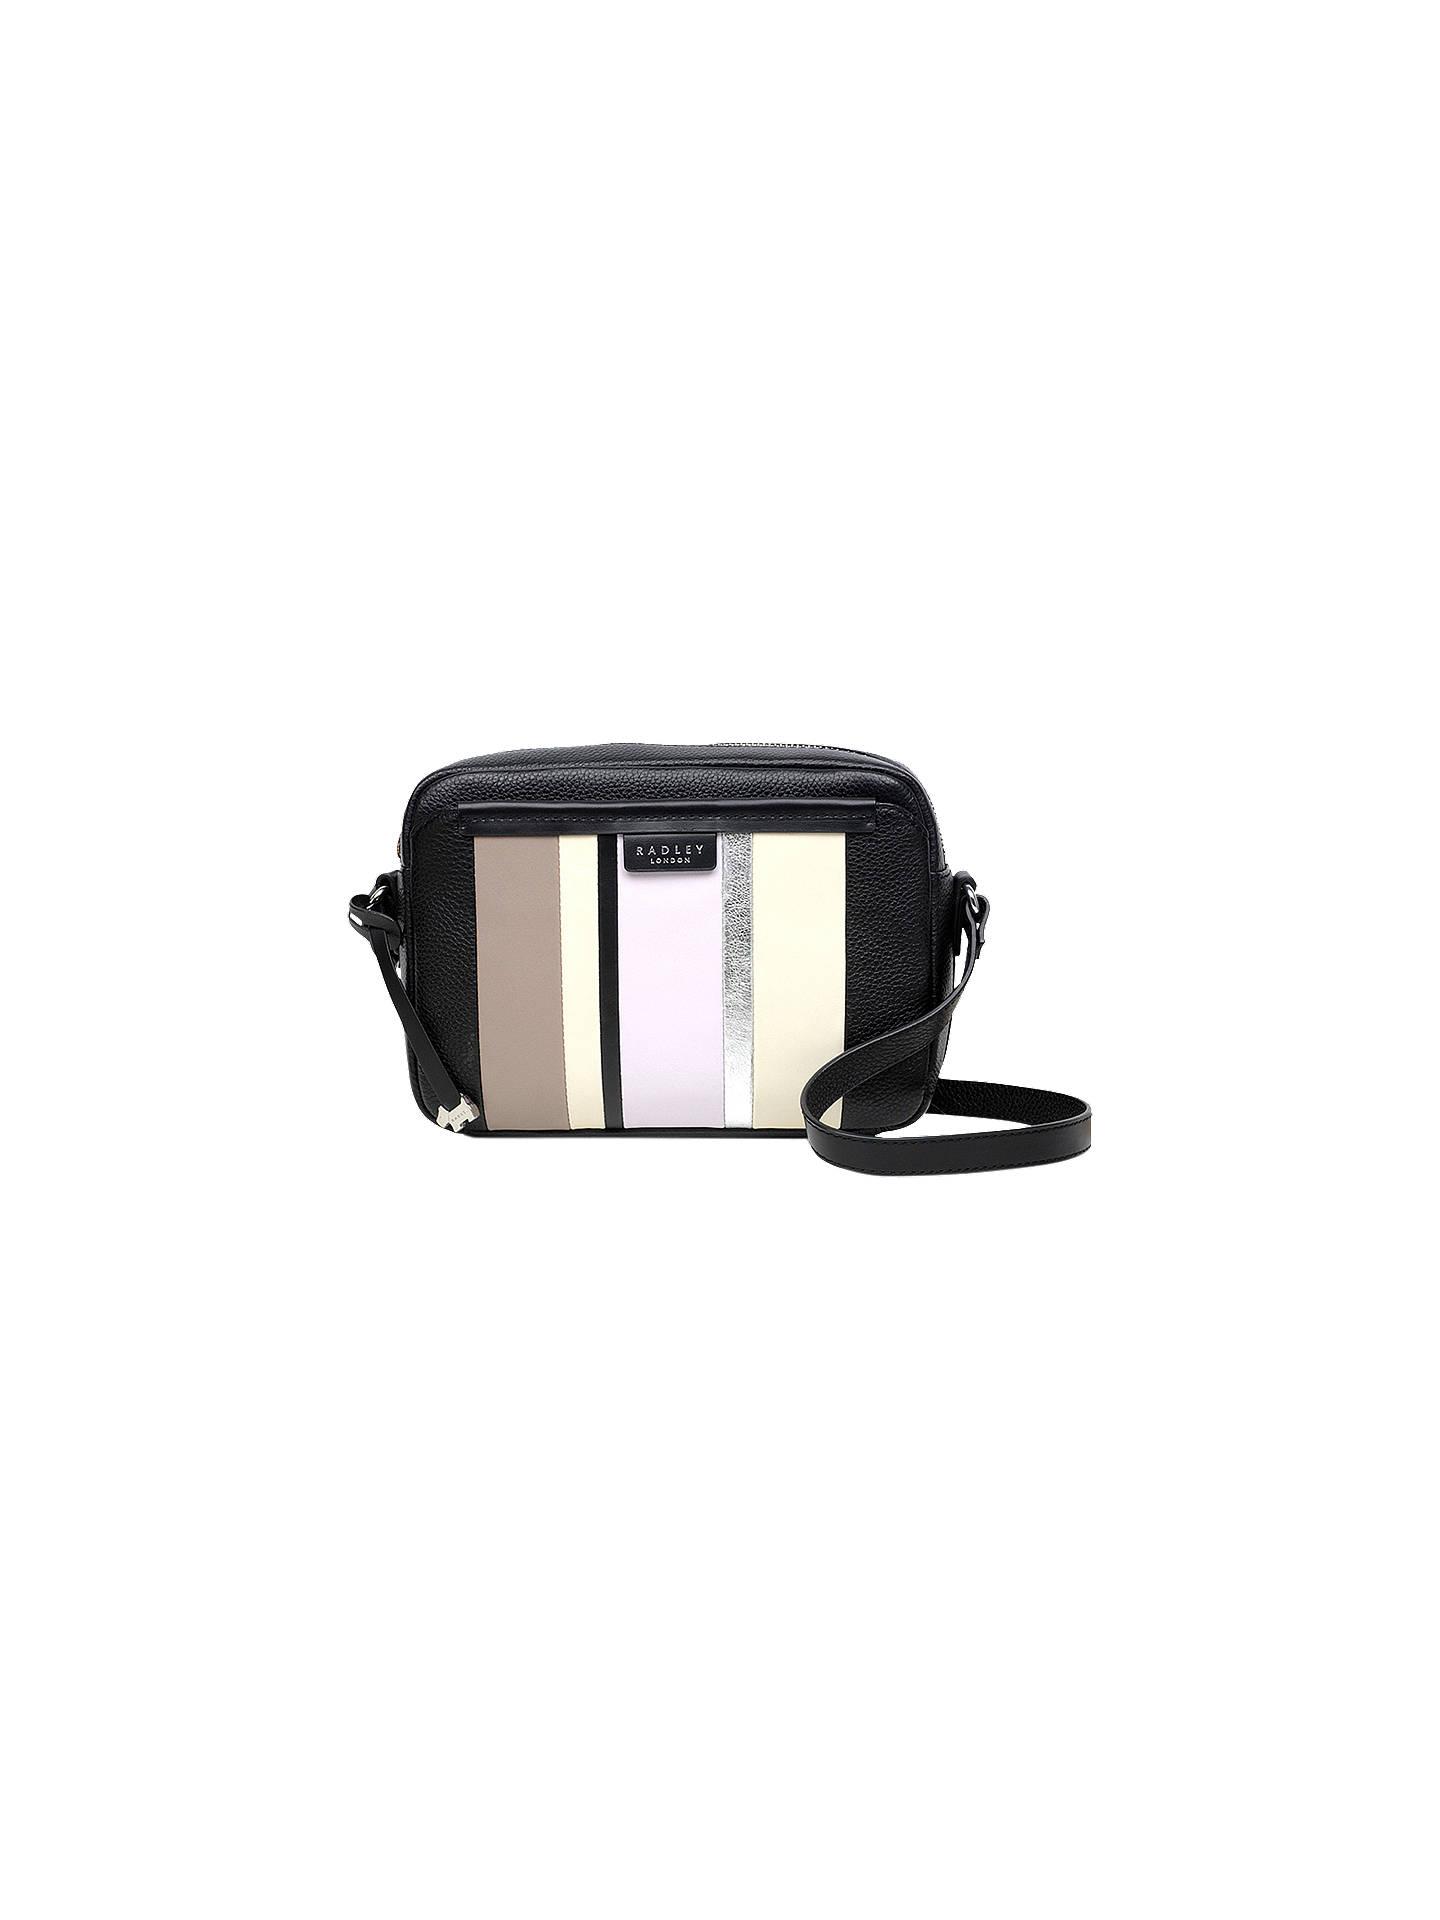 0dd9a45770 Radley Penhurst Medium Leather Cross Body Bag at John Lewis   Partners